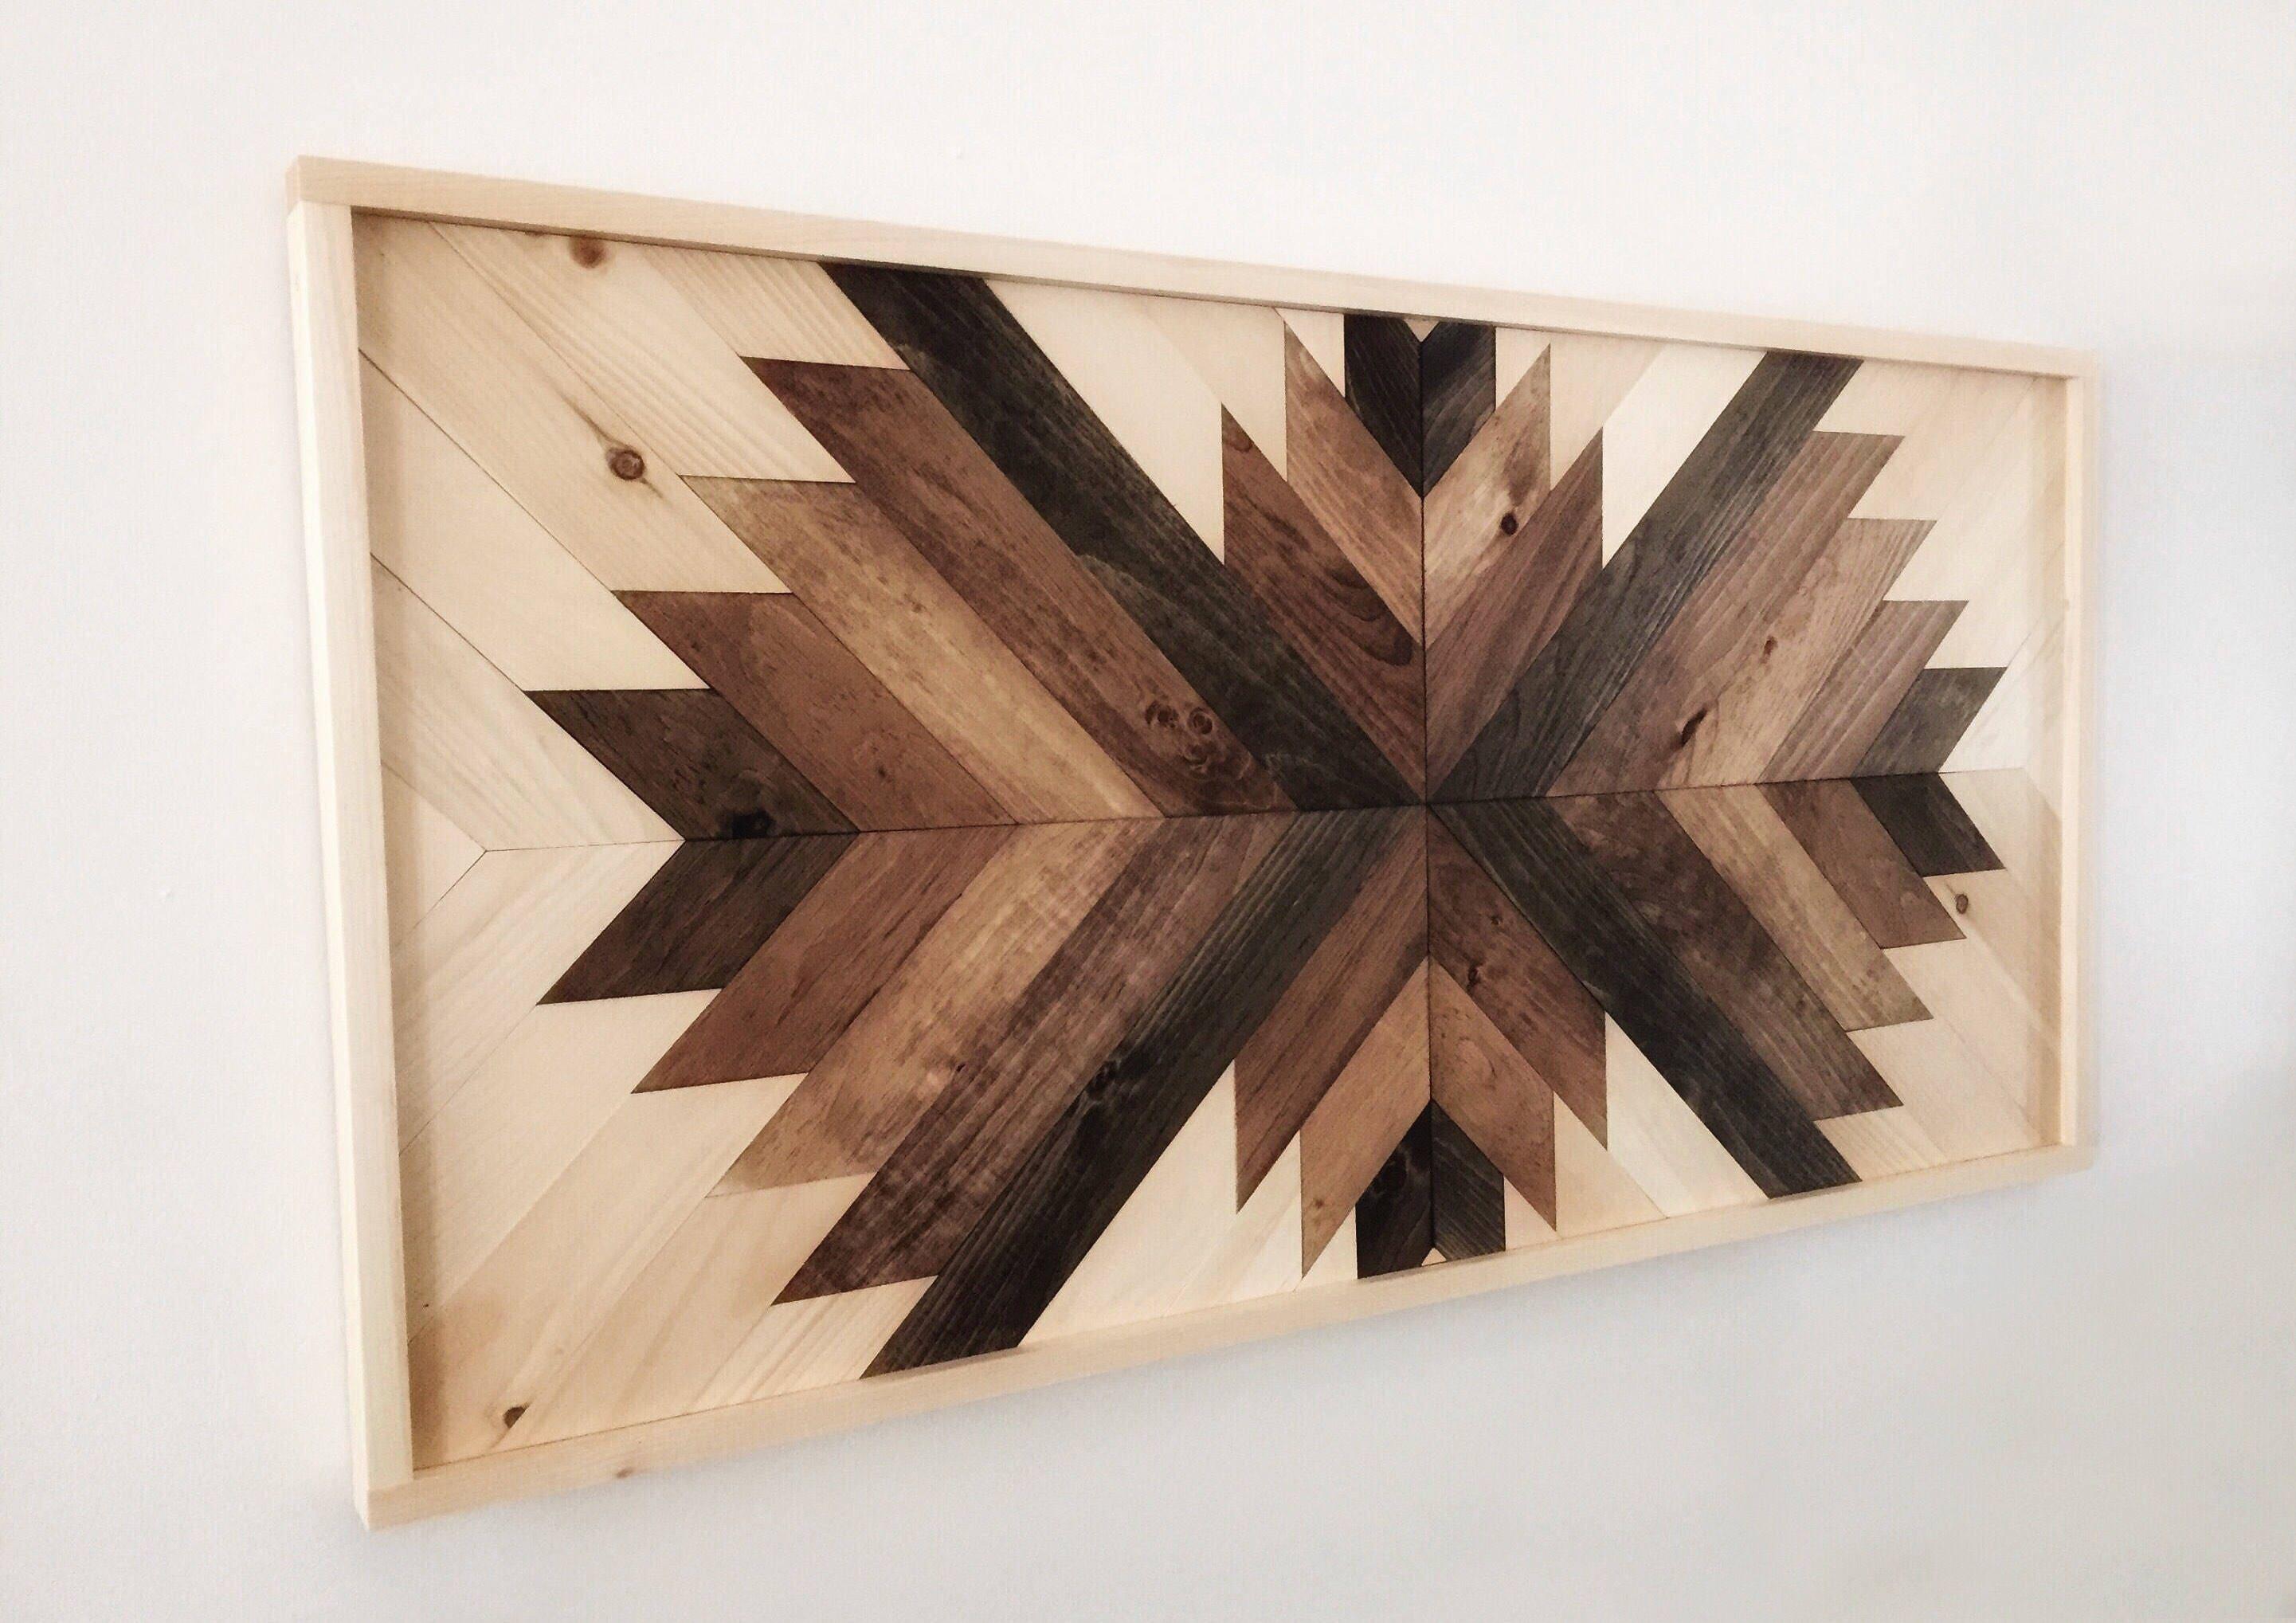 Reclaimed Wood Wall Art Sunburst in Brown Multicolor